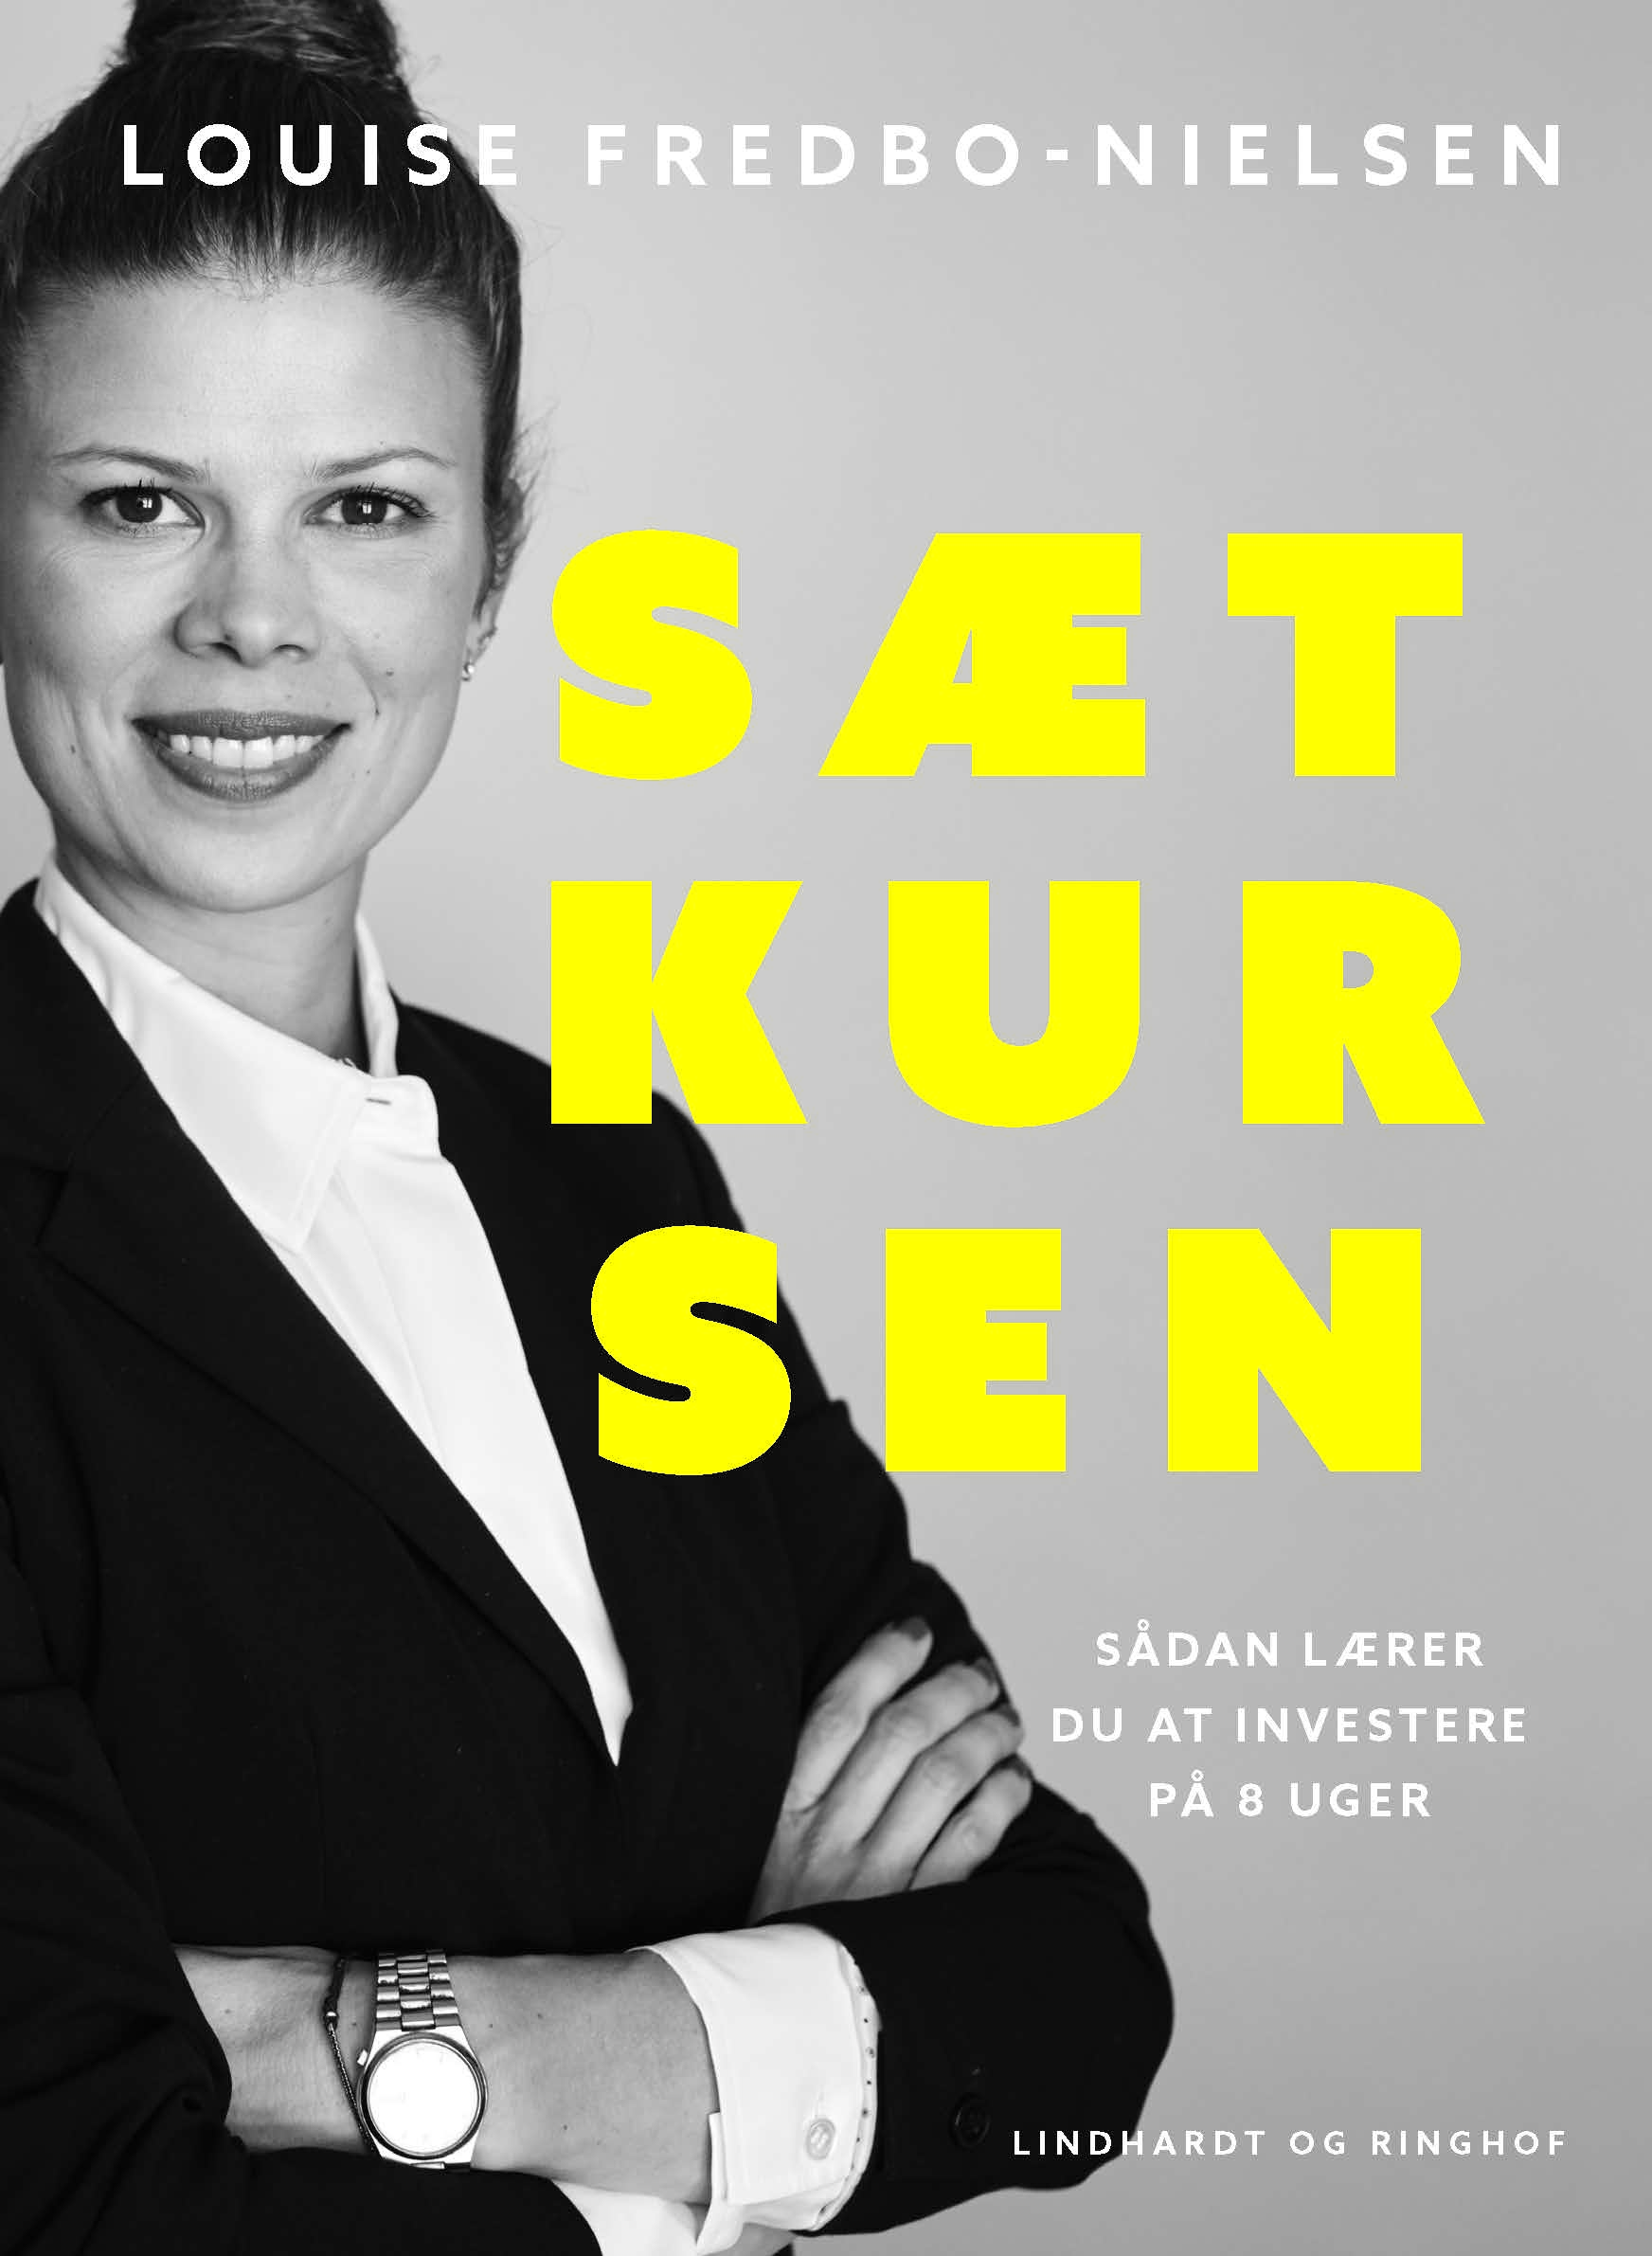 Louise Fredbo-Nielsen lær at investere